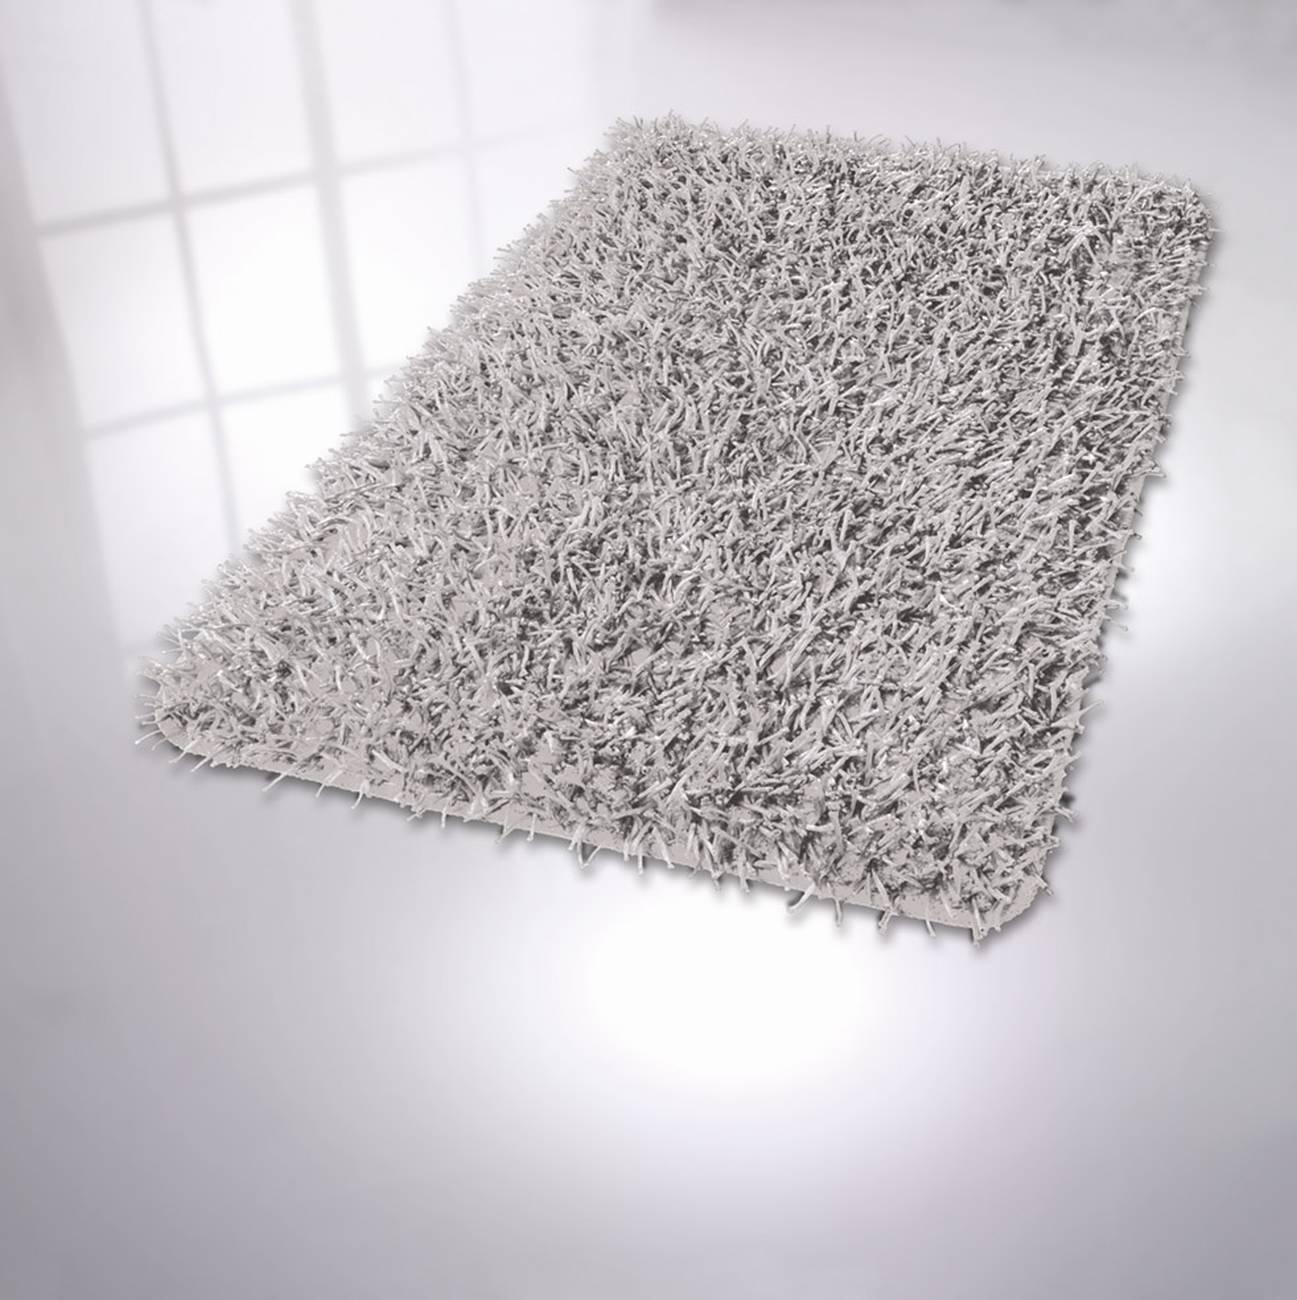 Badteppich Riva 75 % Polyester / 25 % Polyacryl Silbergrau 70x120 cm